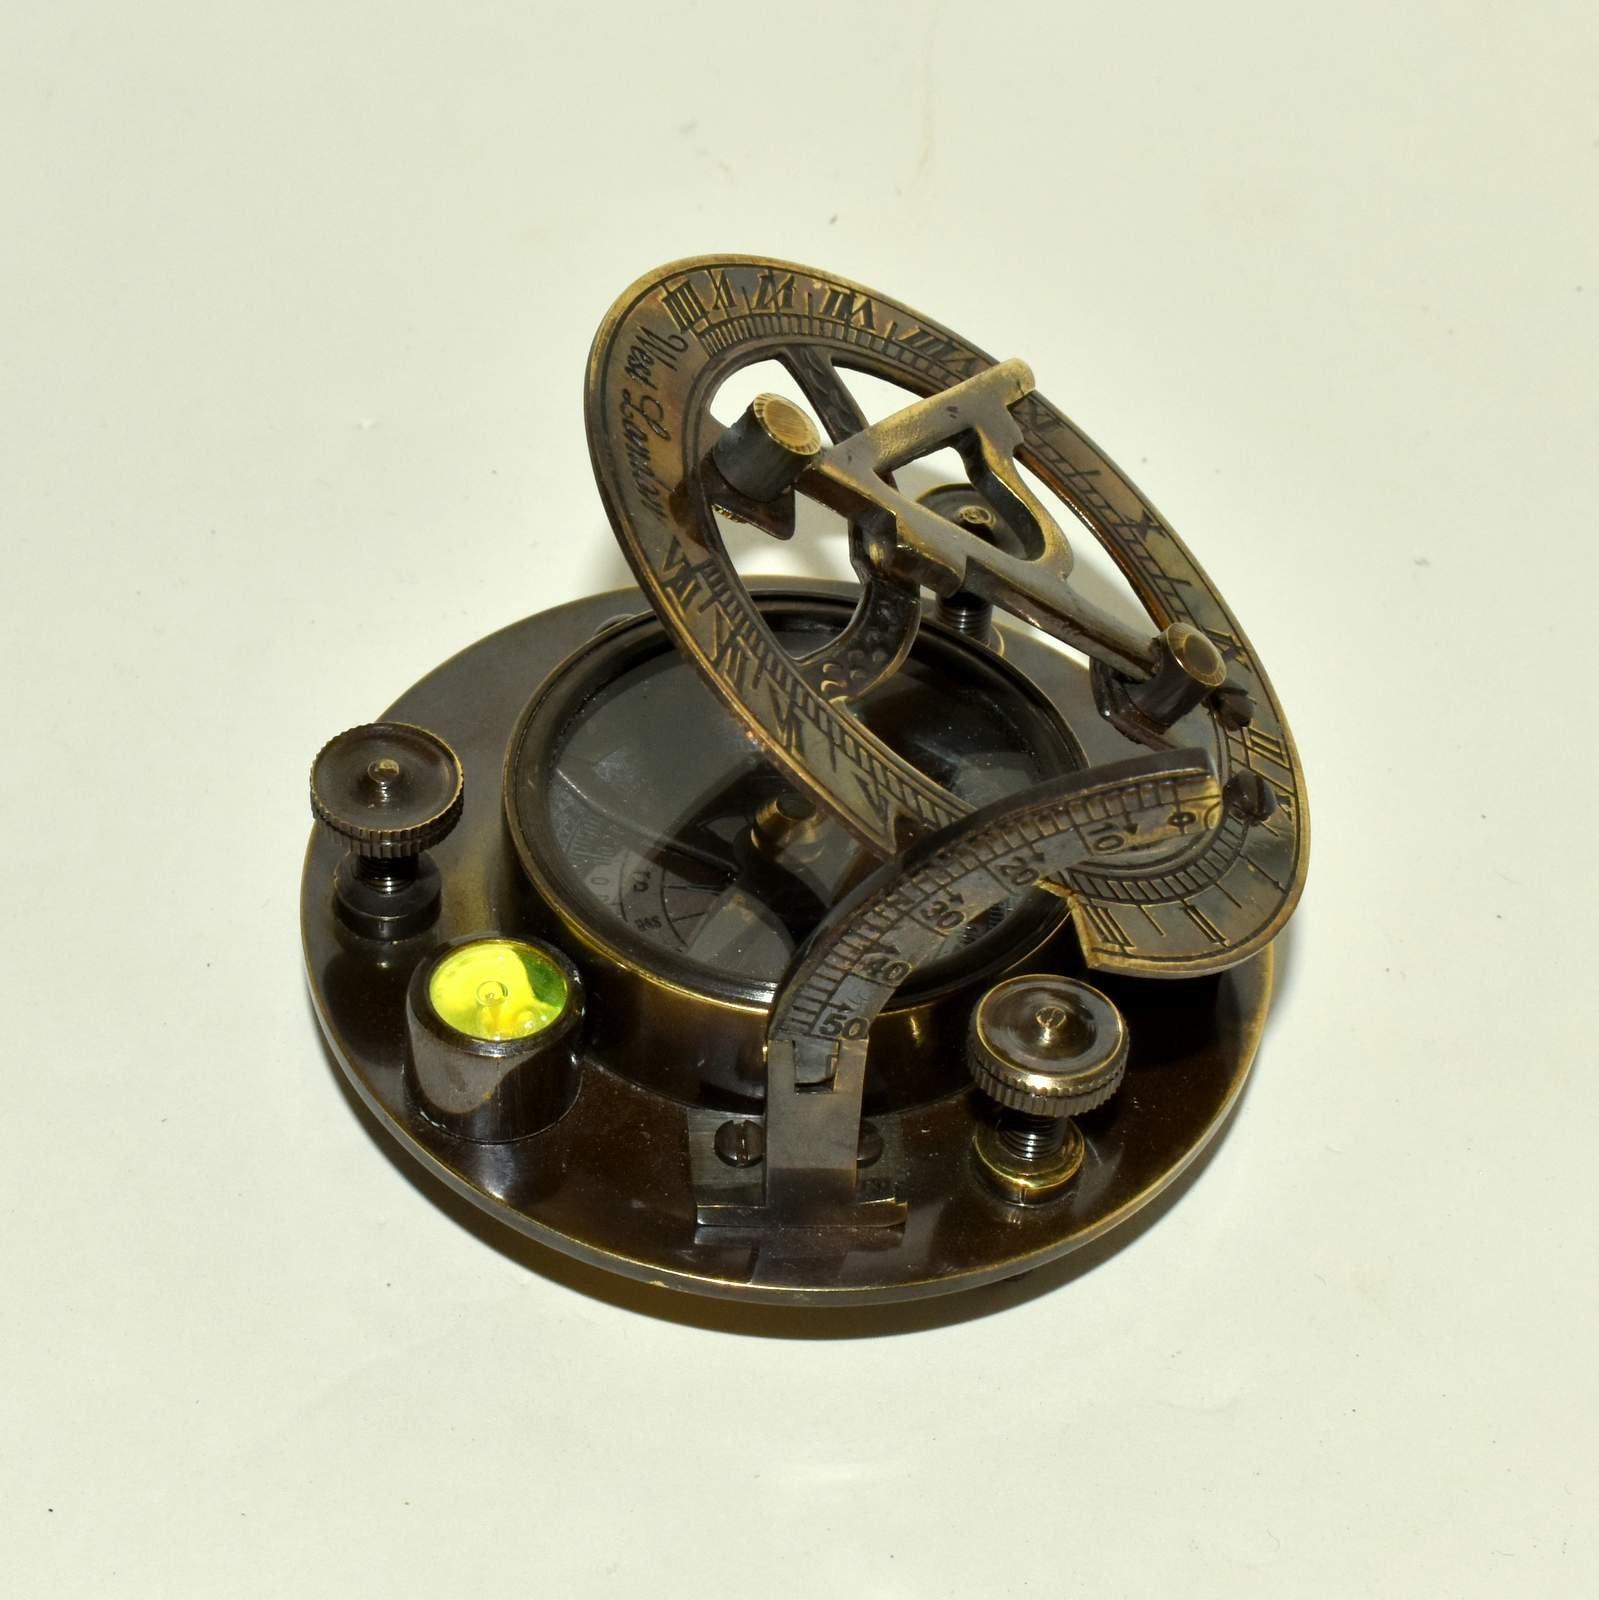 Brass Sundial Compass with Spirit Level 3'' Nautical Compass 2 Pieces